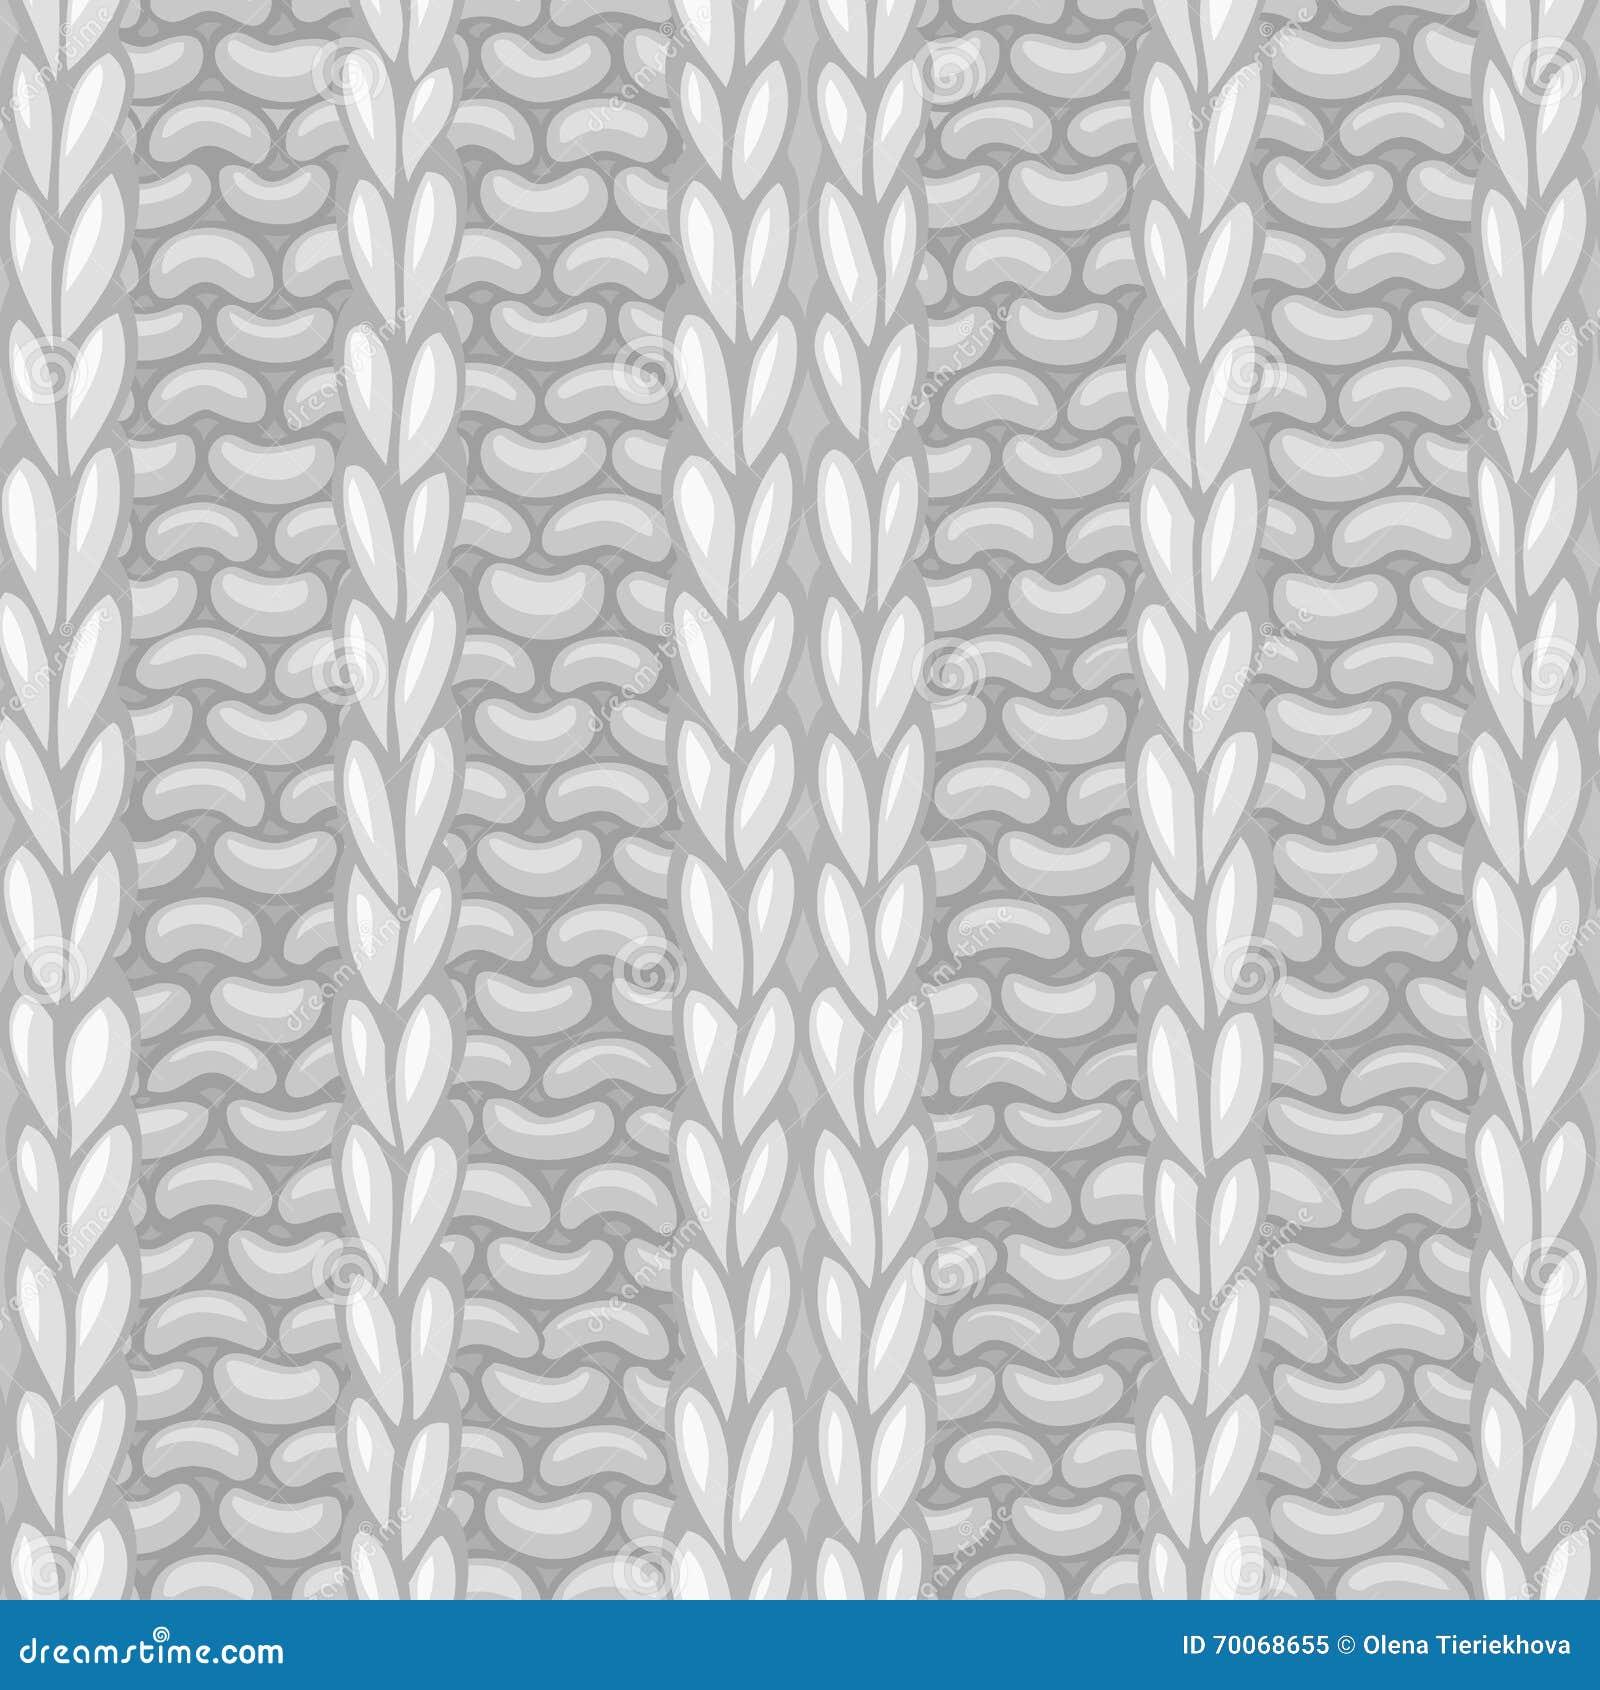 Seamless Ribbing Stitch Pattern. Stock Vector - Image: 70068655